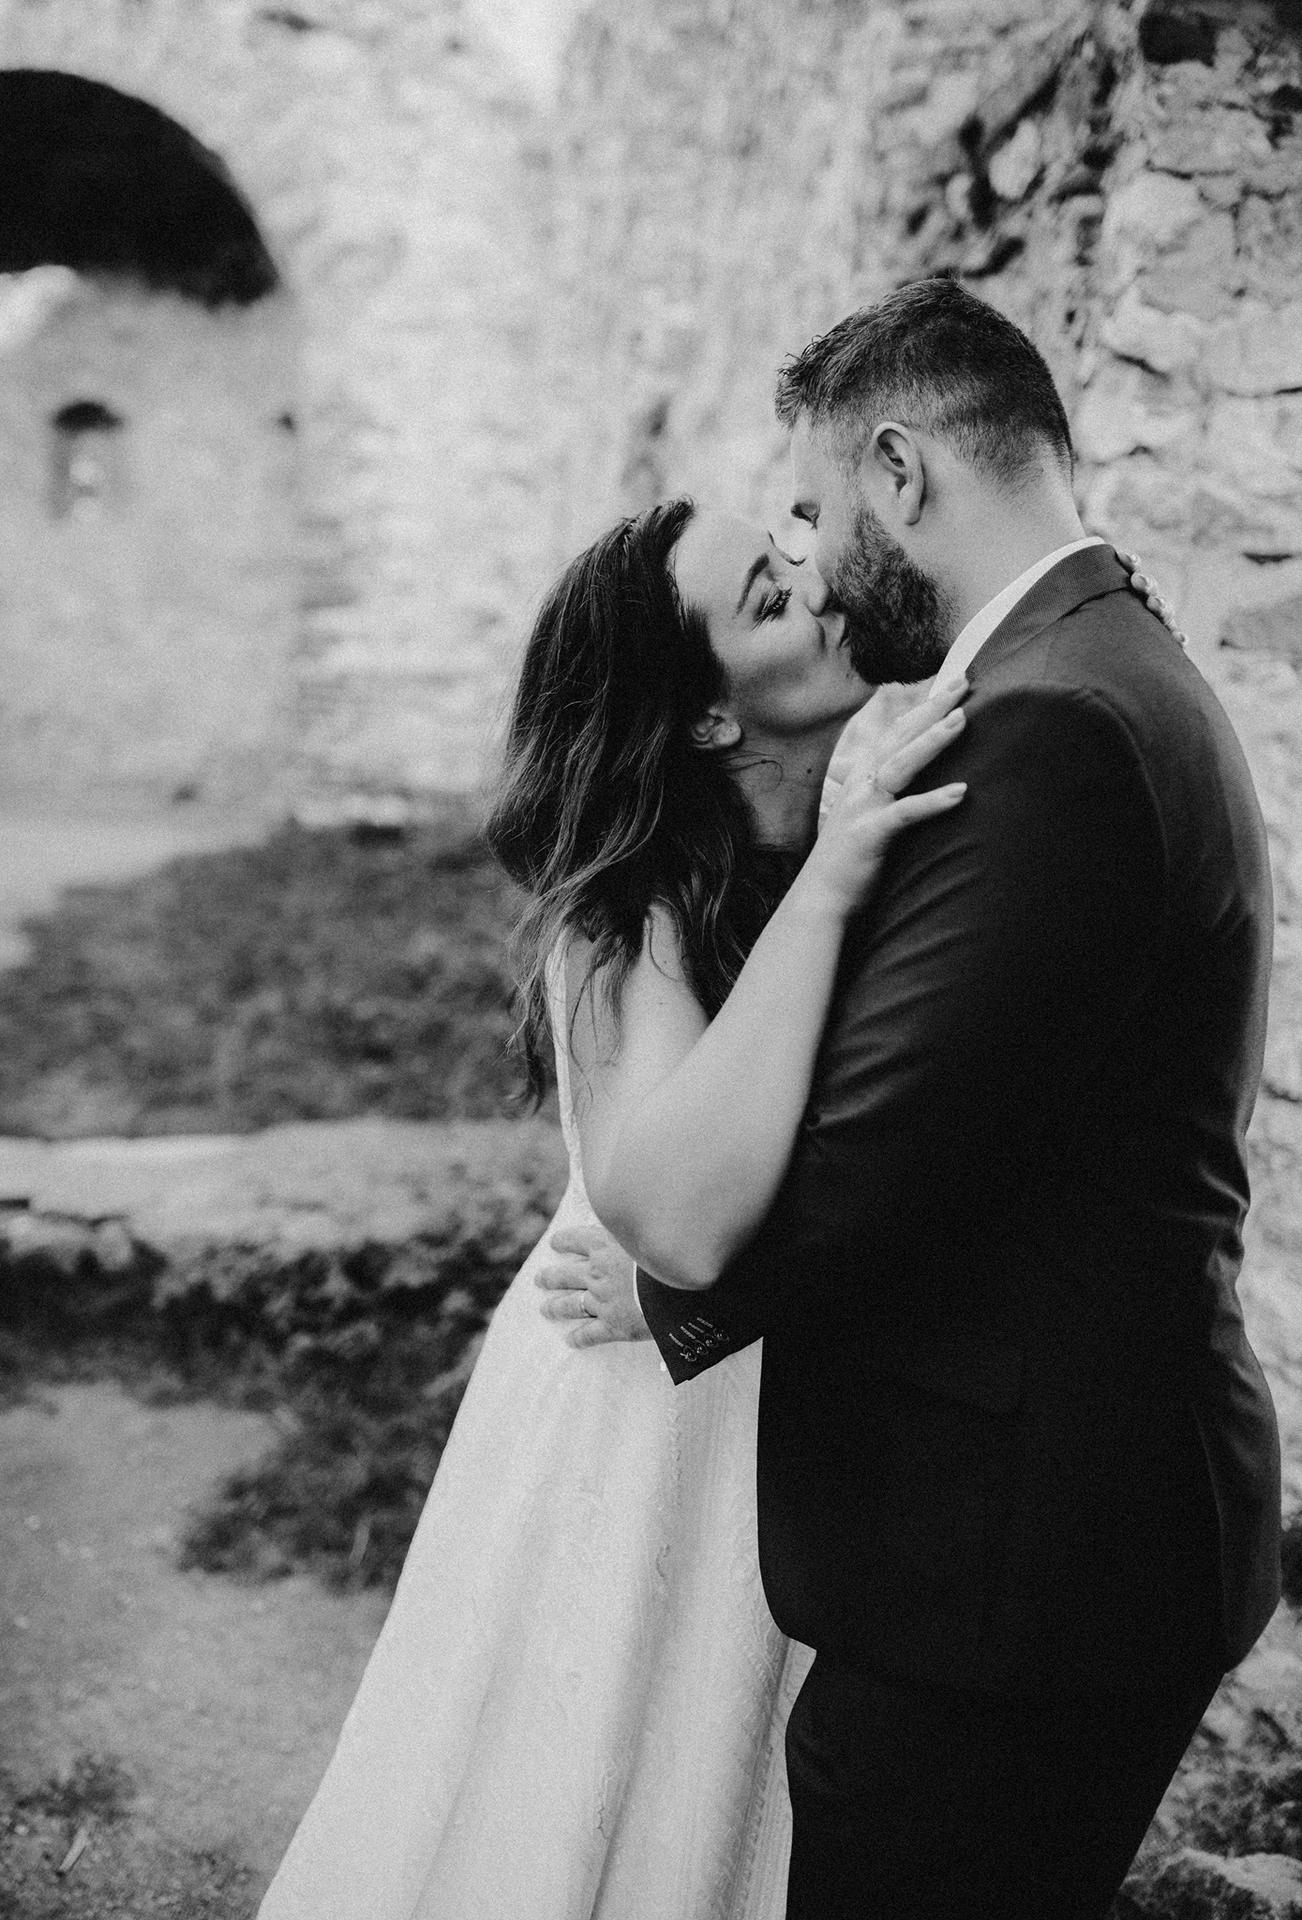 Mr. & Mrs. ❤️ - Obrázok č. 1